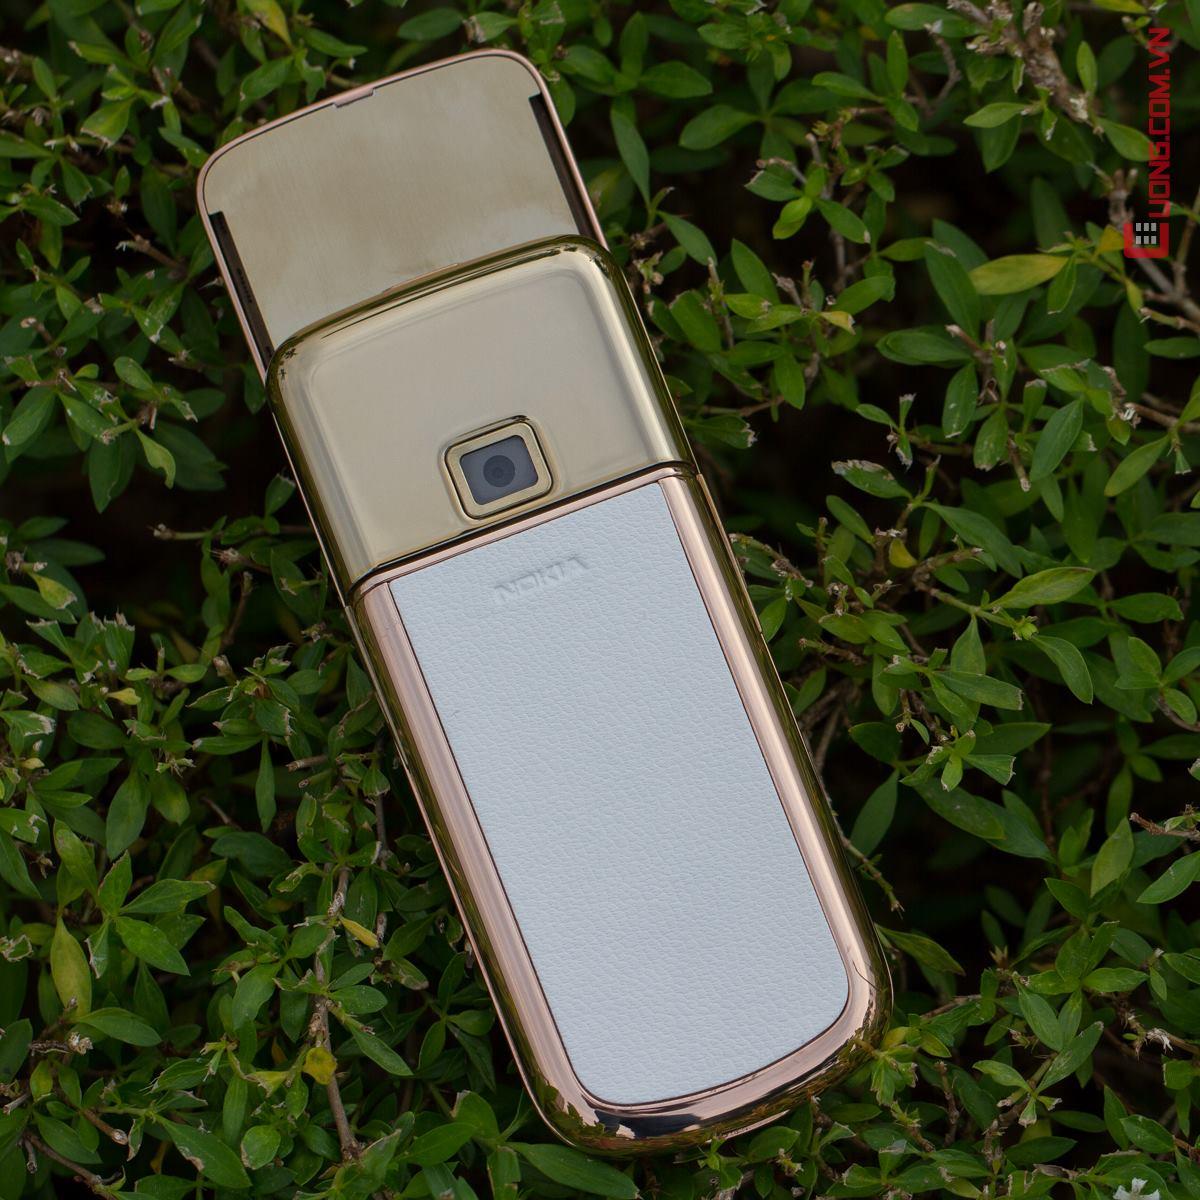 Nokia 8800 Gold Arte v?i l?p da m?nh m? ph?n sau